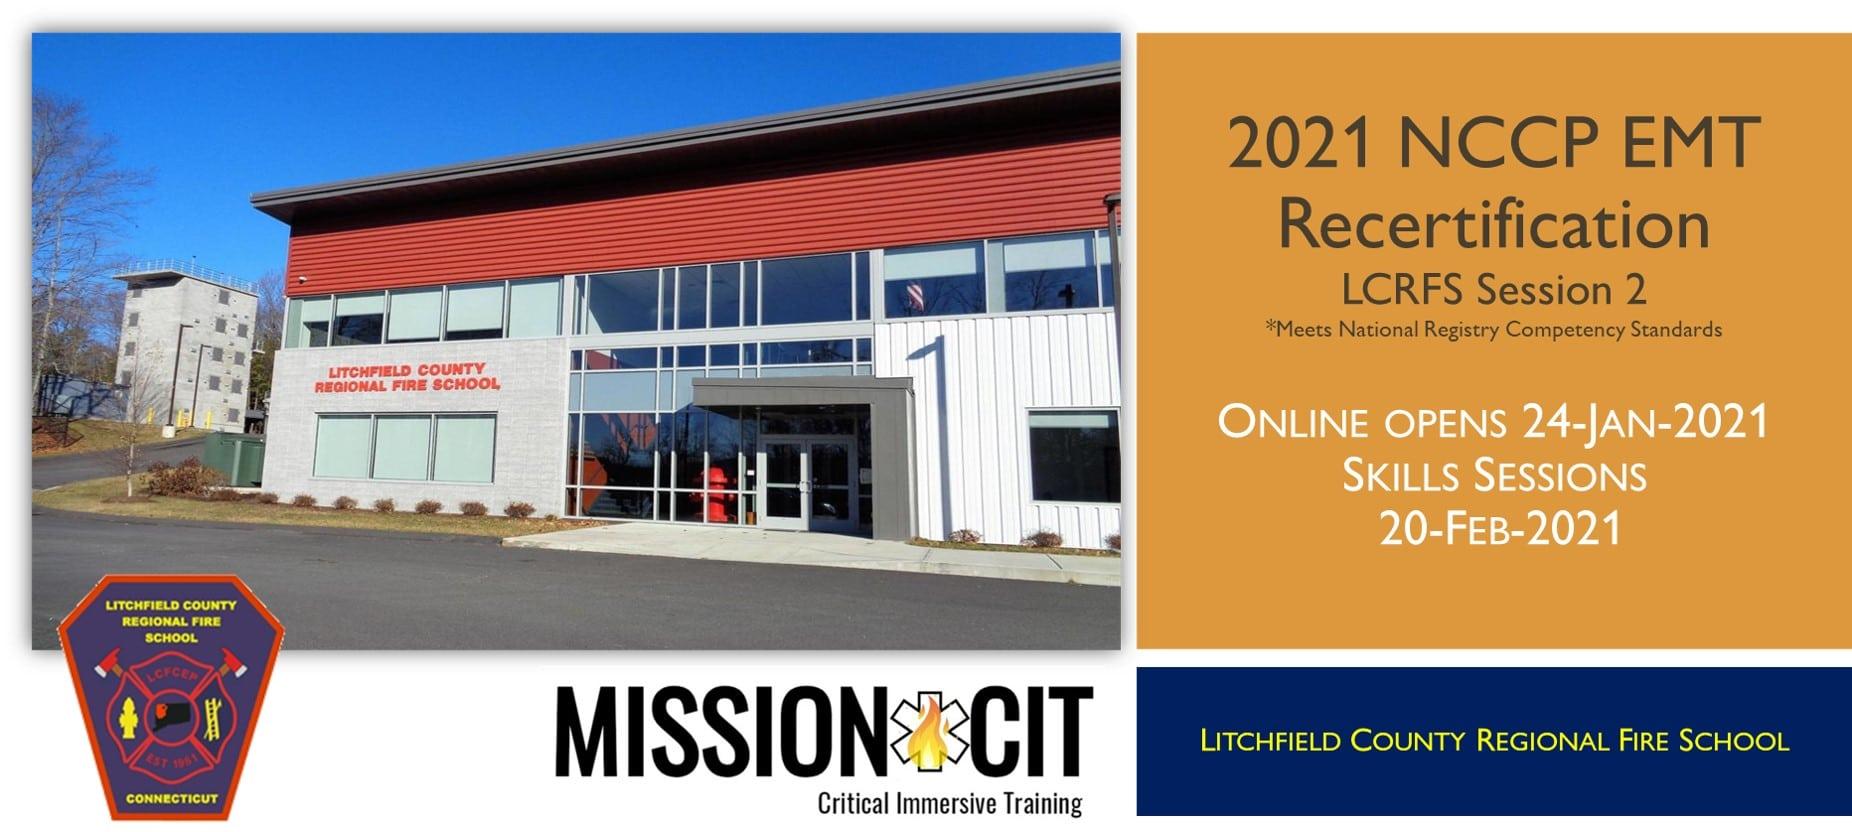 EMT NCCP 2021 Recertification Course | LCRFS Session 2